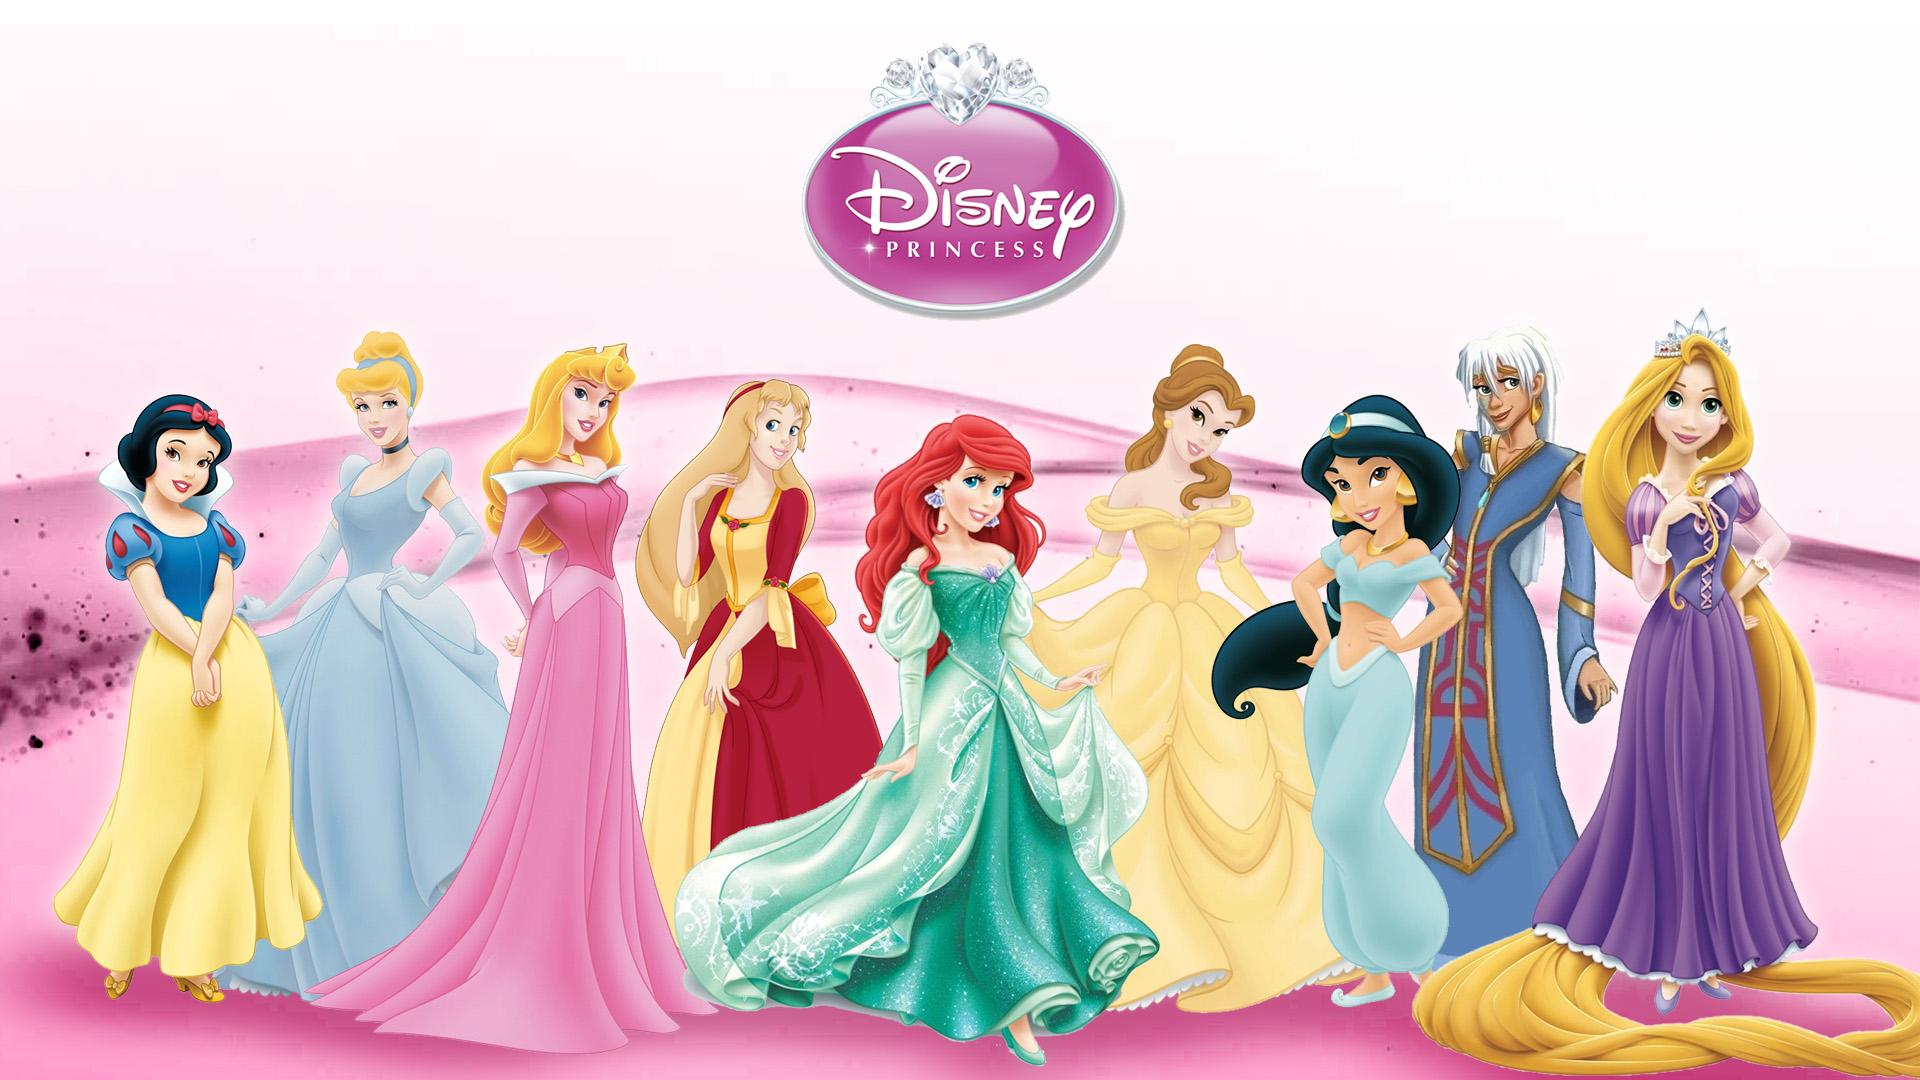 Ariel Belle Cinderella Aurora Disney Princess Hd Wallpaper For Fb